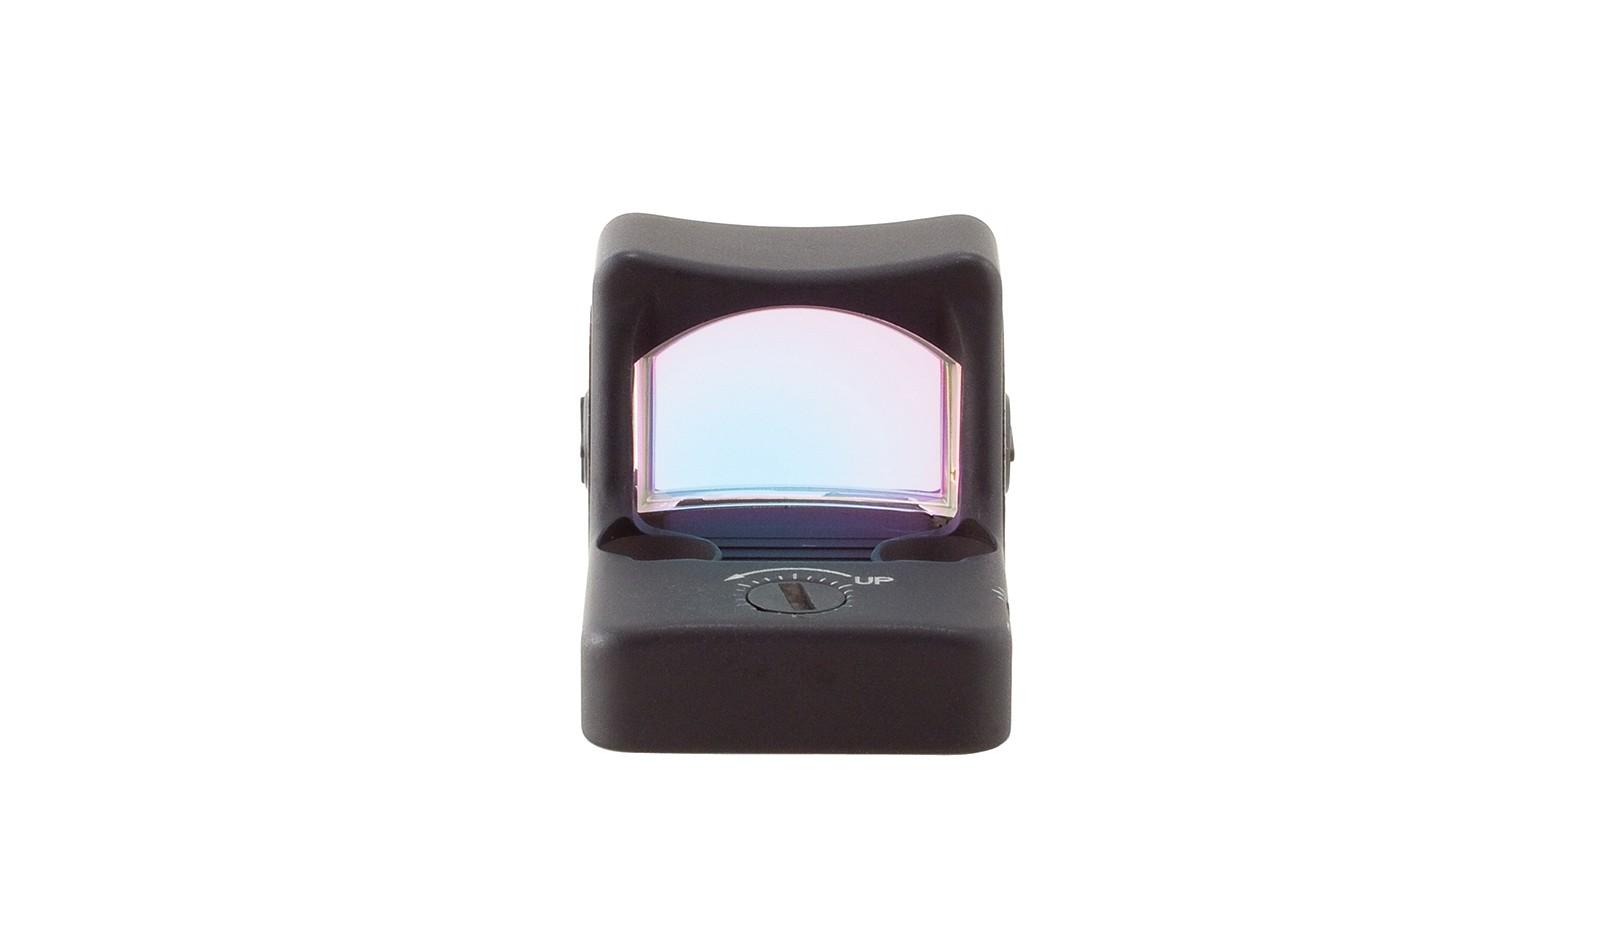 Trijicon RMR Typ 2 Adjustable Red Dot Sight 3.25 MOA Bild 04